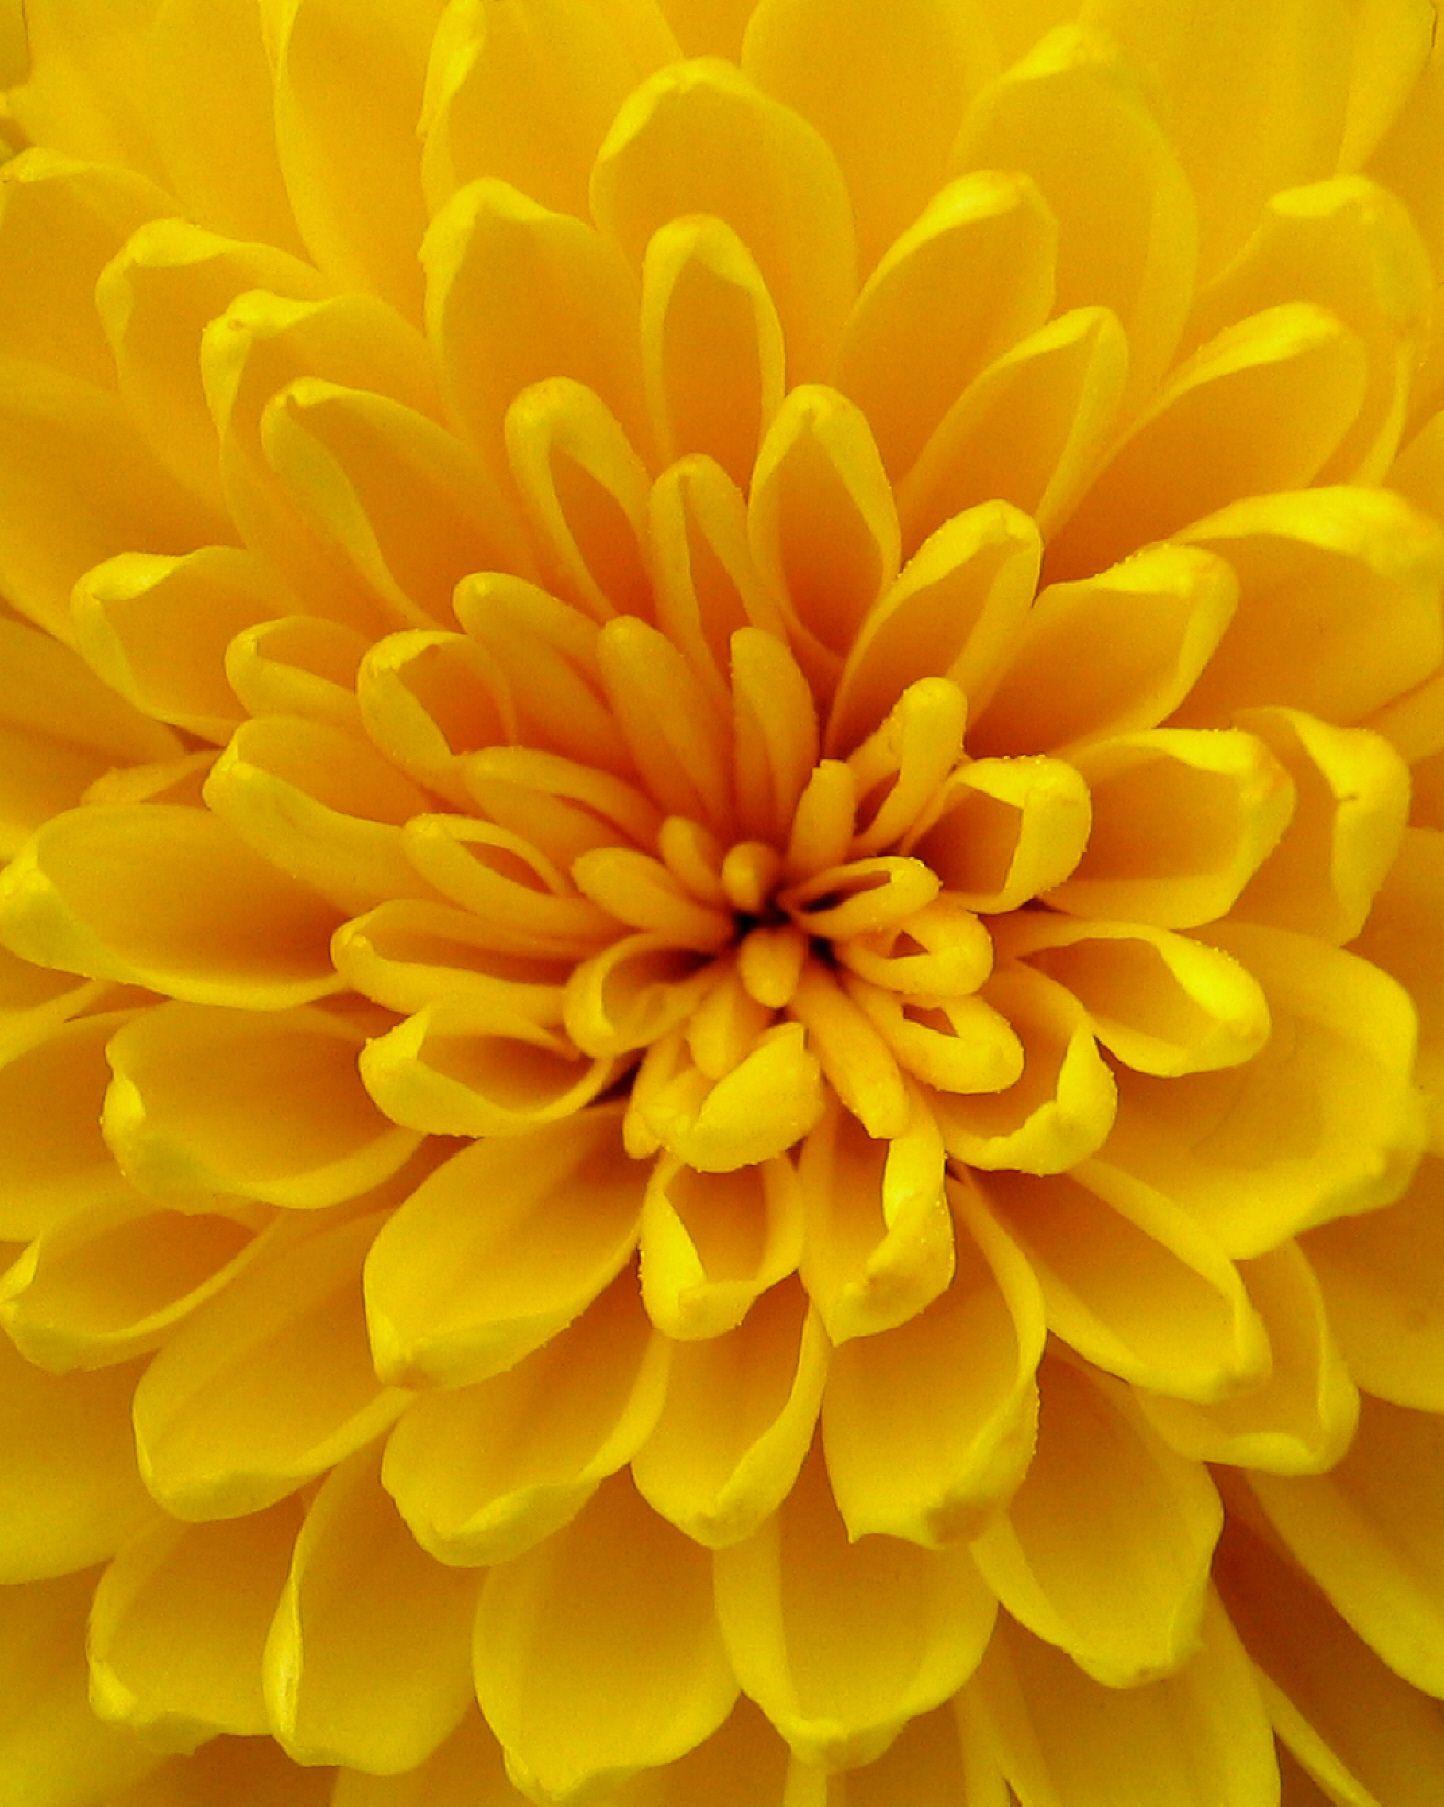 предлагаем желтые картинки смотреть сама роузи